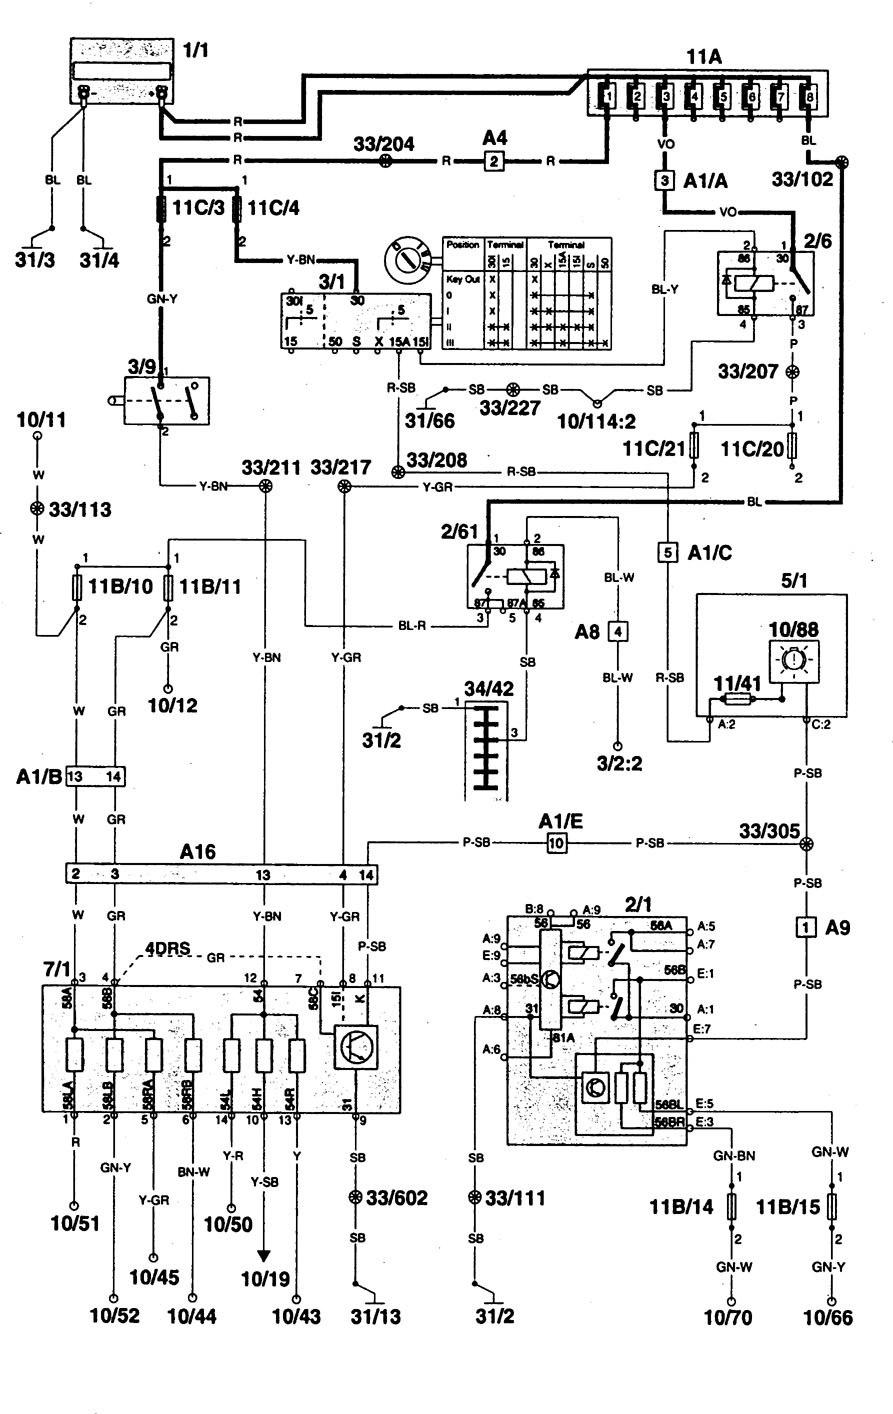 hight resolution of 1995 volvo 960 radio wiring diagram data wiring diagram rh 35 hrc solarhandel de 1993 volvo 940 radio wiring diagram 1995 volvo 940 radio wiring diagram